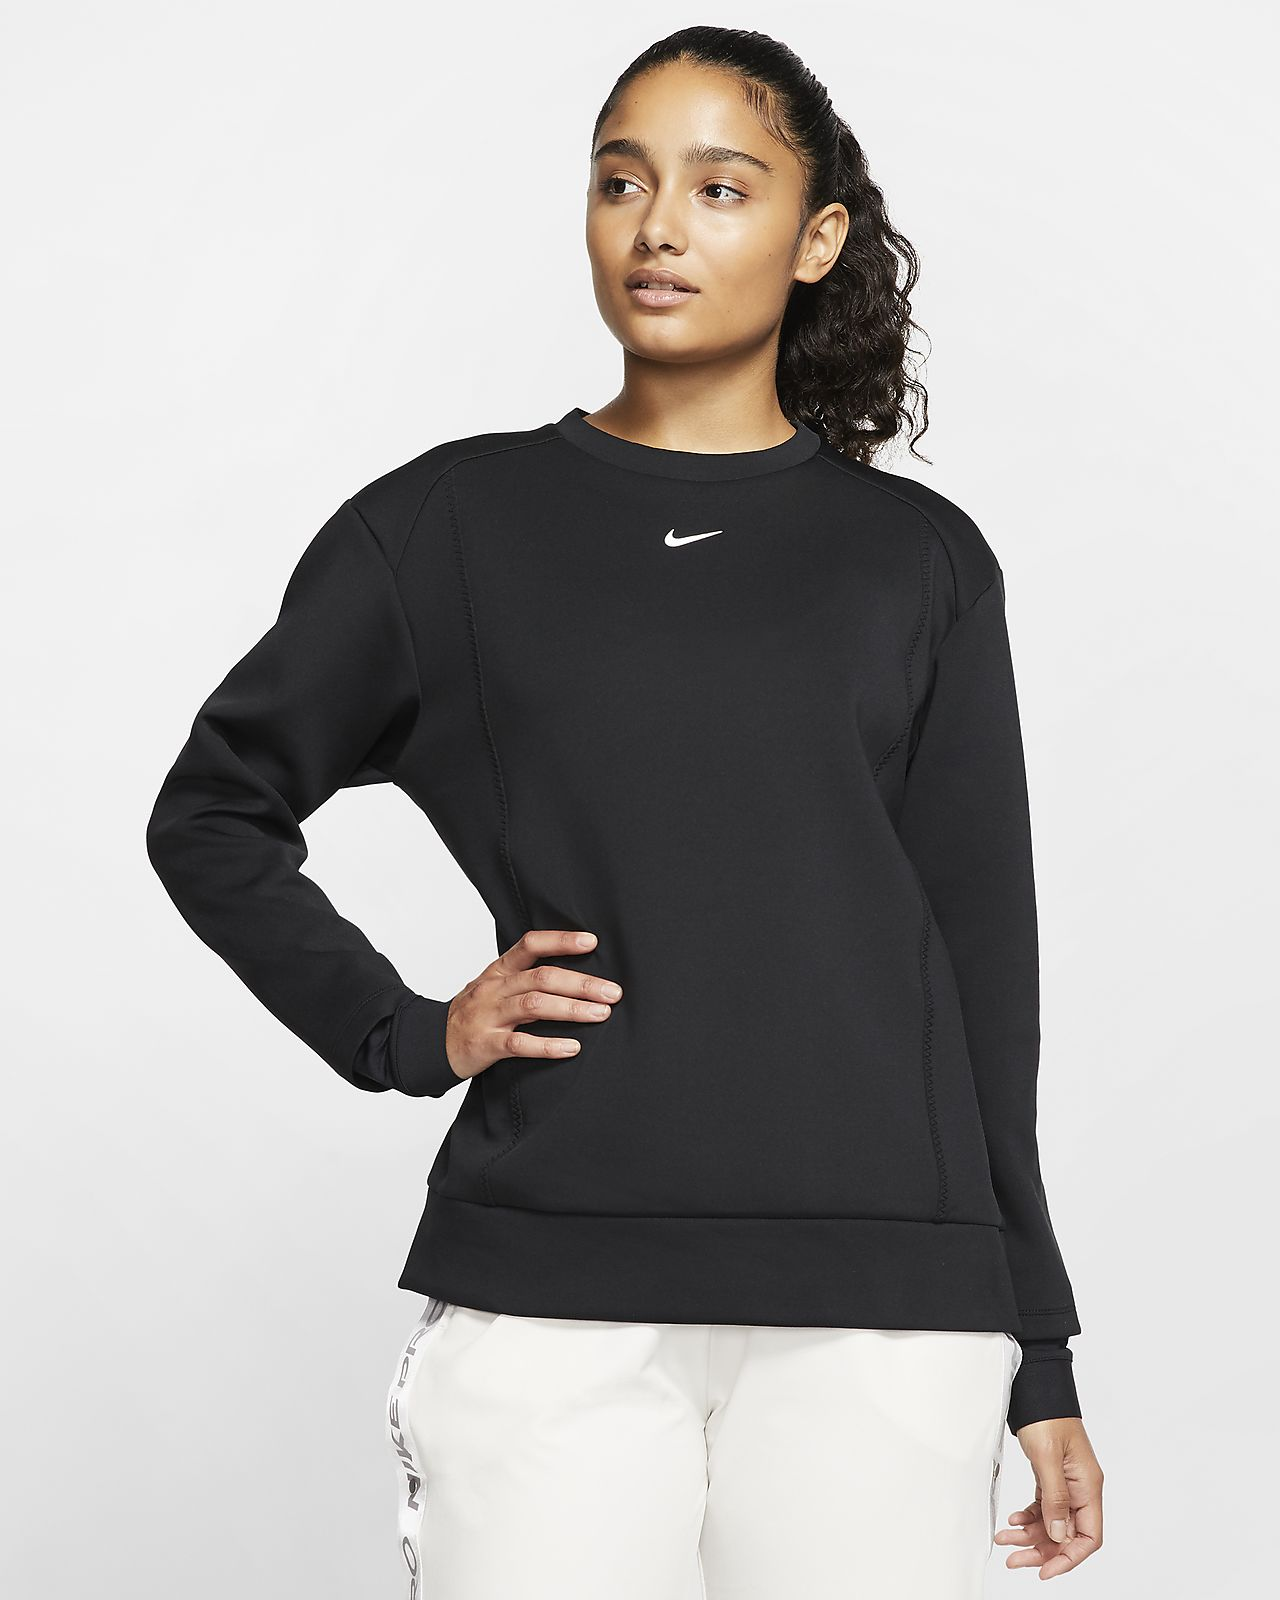 Haut en tissu Fleece Nike Pro pour Femme